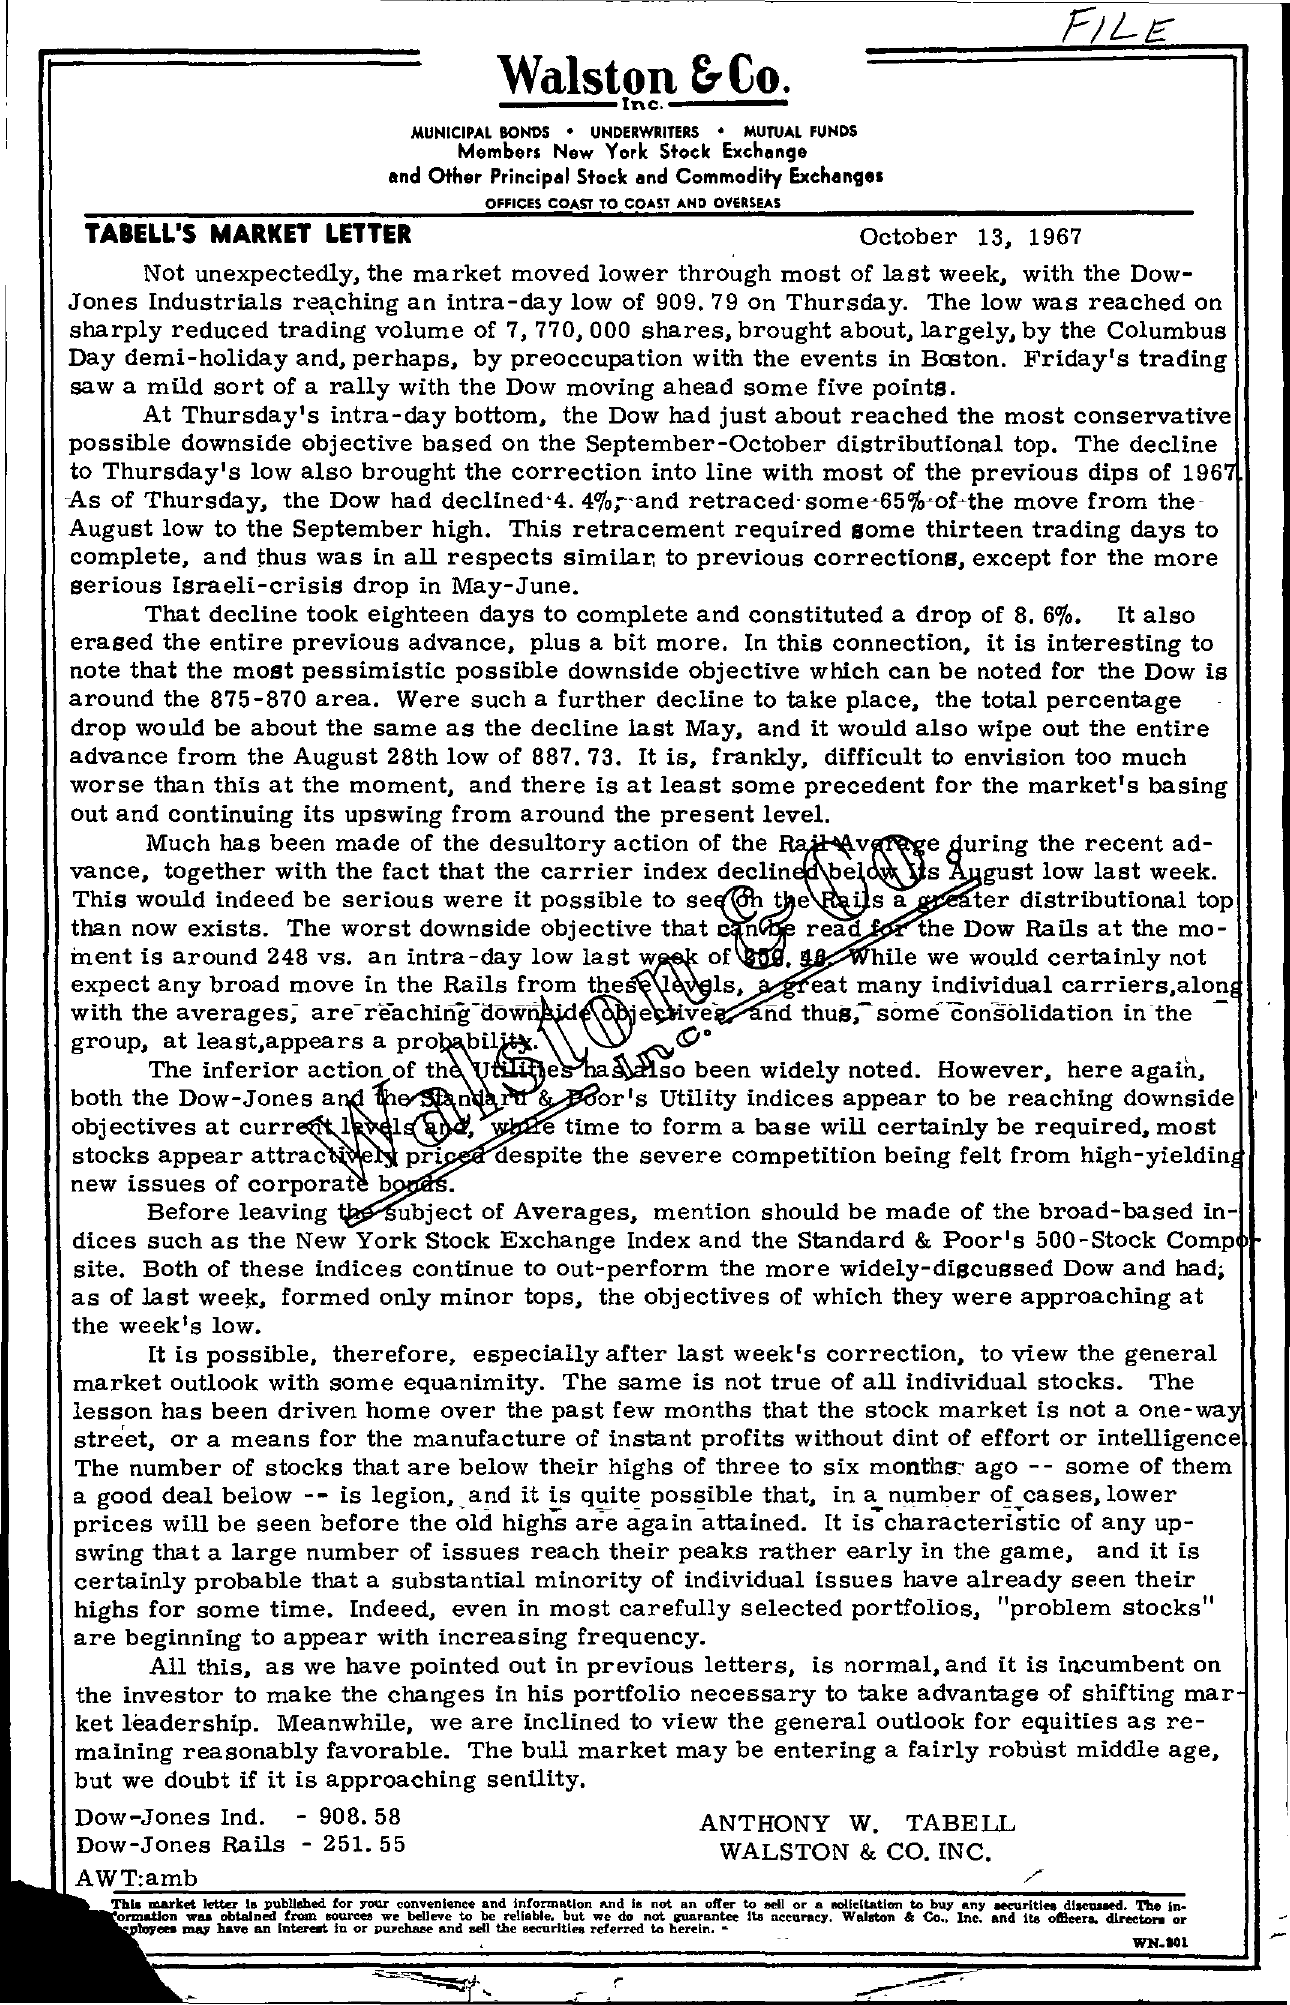 Tabell's Market Letter - October 13, 1967